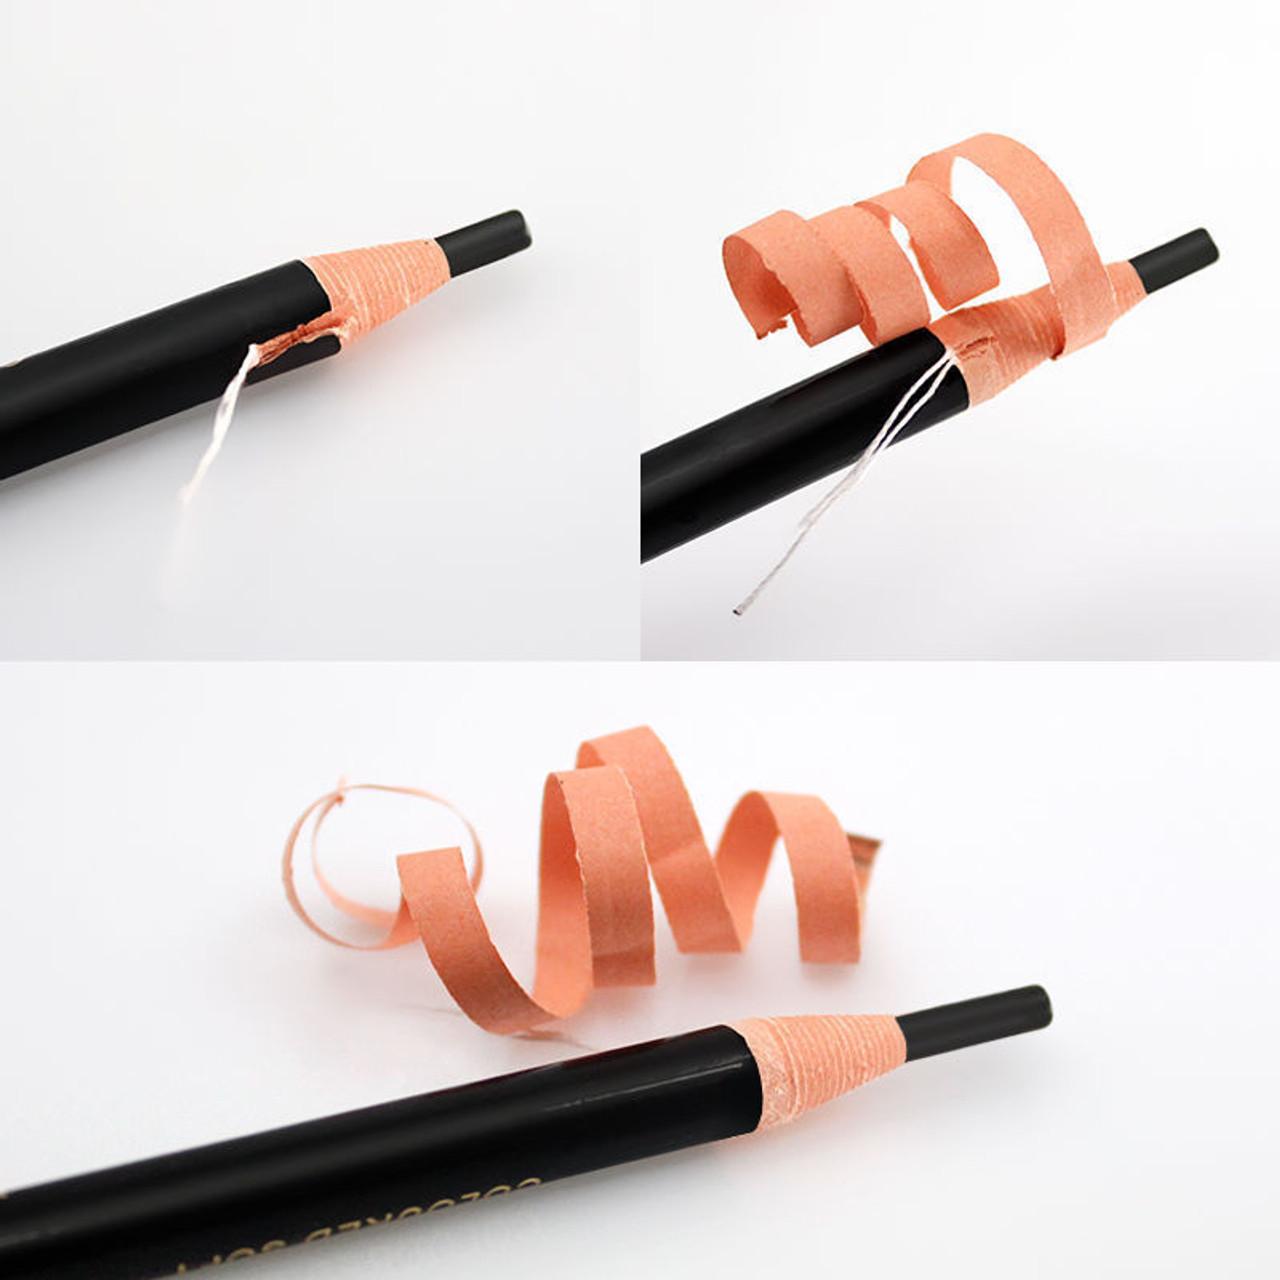 Eyebrow Pencil Colored Soft Cosmetic Art Permanent Makeup Waterproof *1818* BLACK - NO.1 - 1Pc